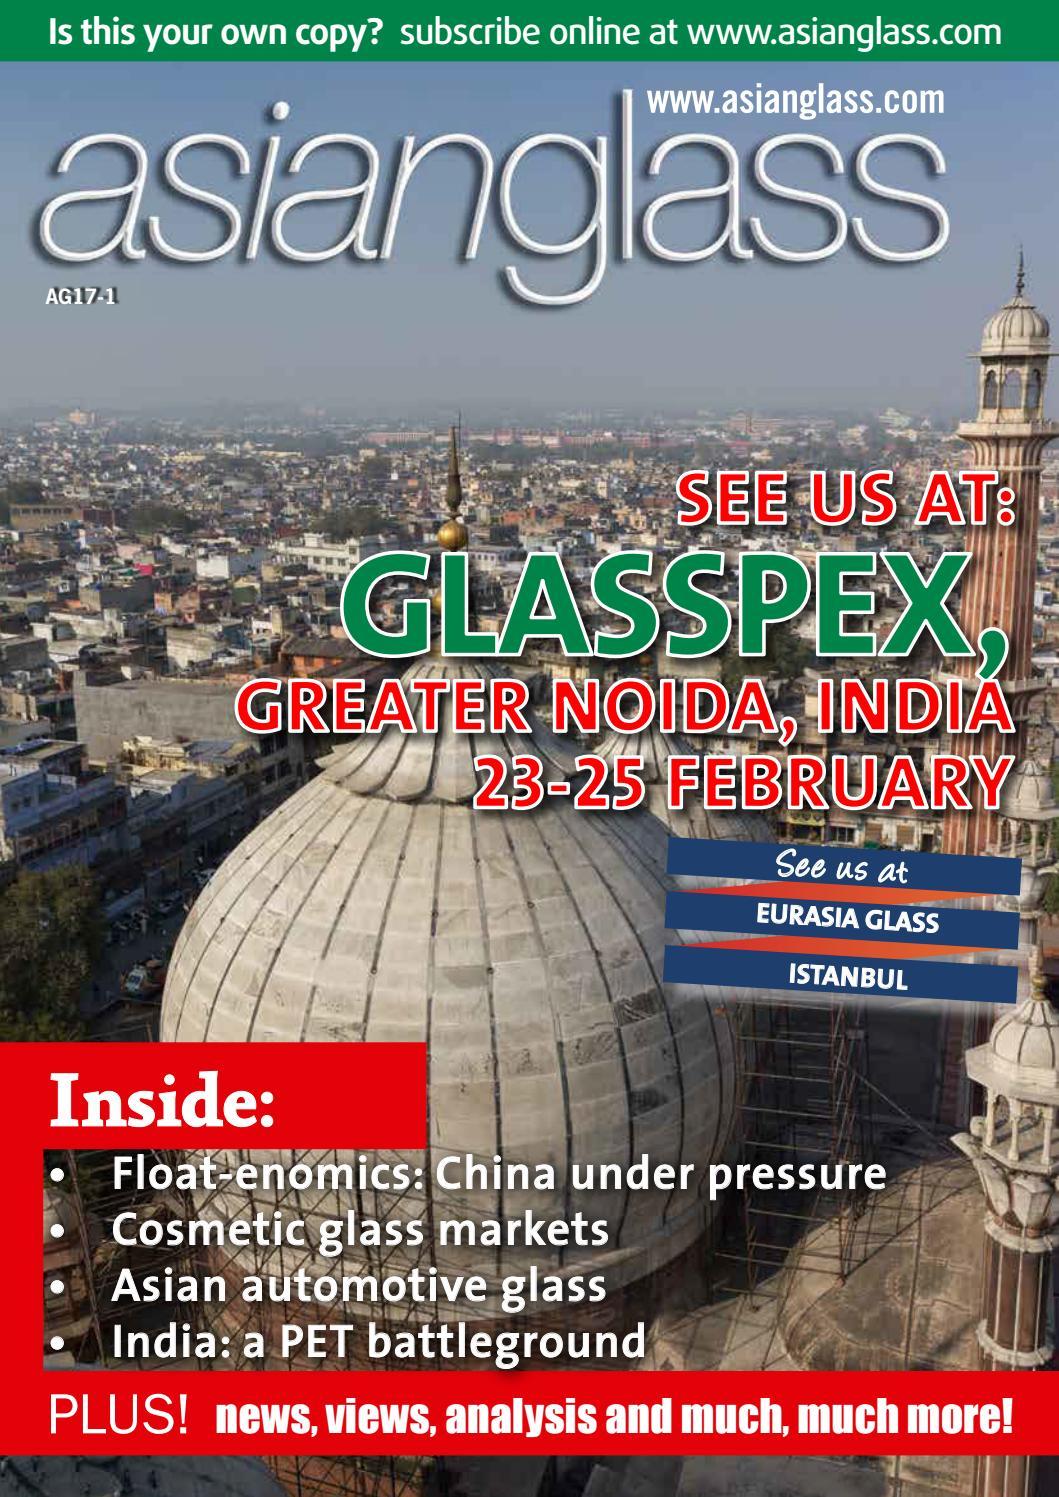 Asian Glass - AG17-1 Edition by Bowhead Media Ltd - Issuu